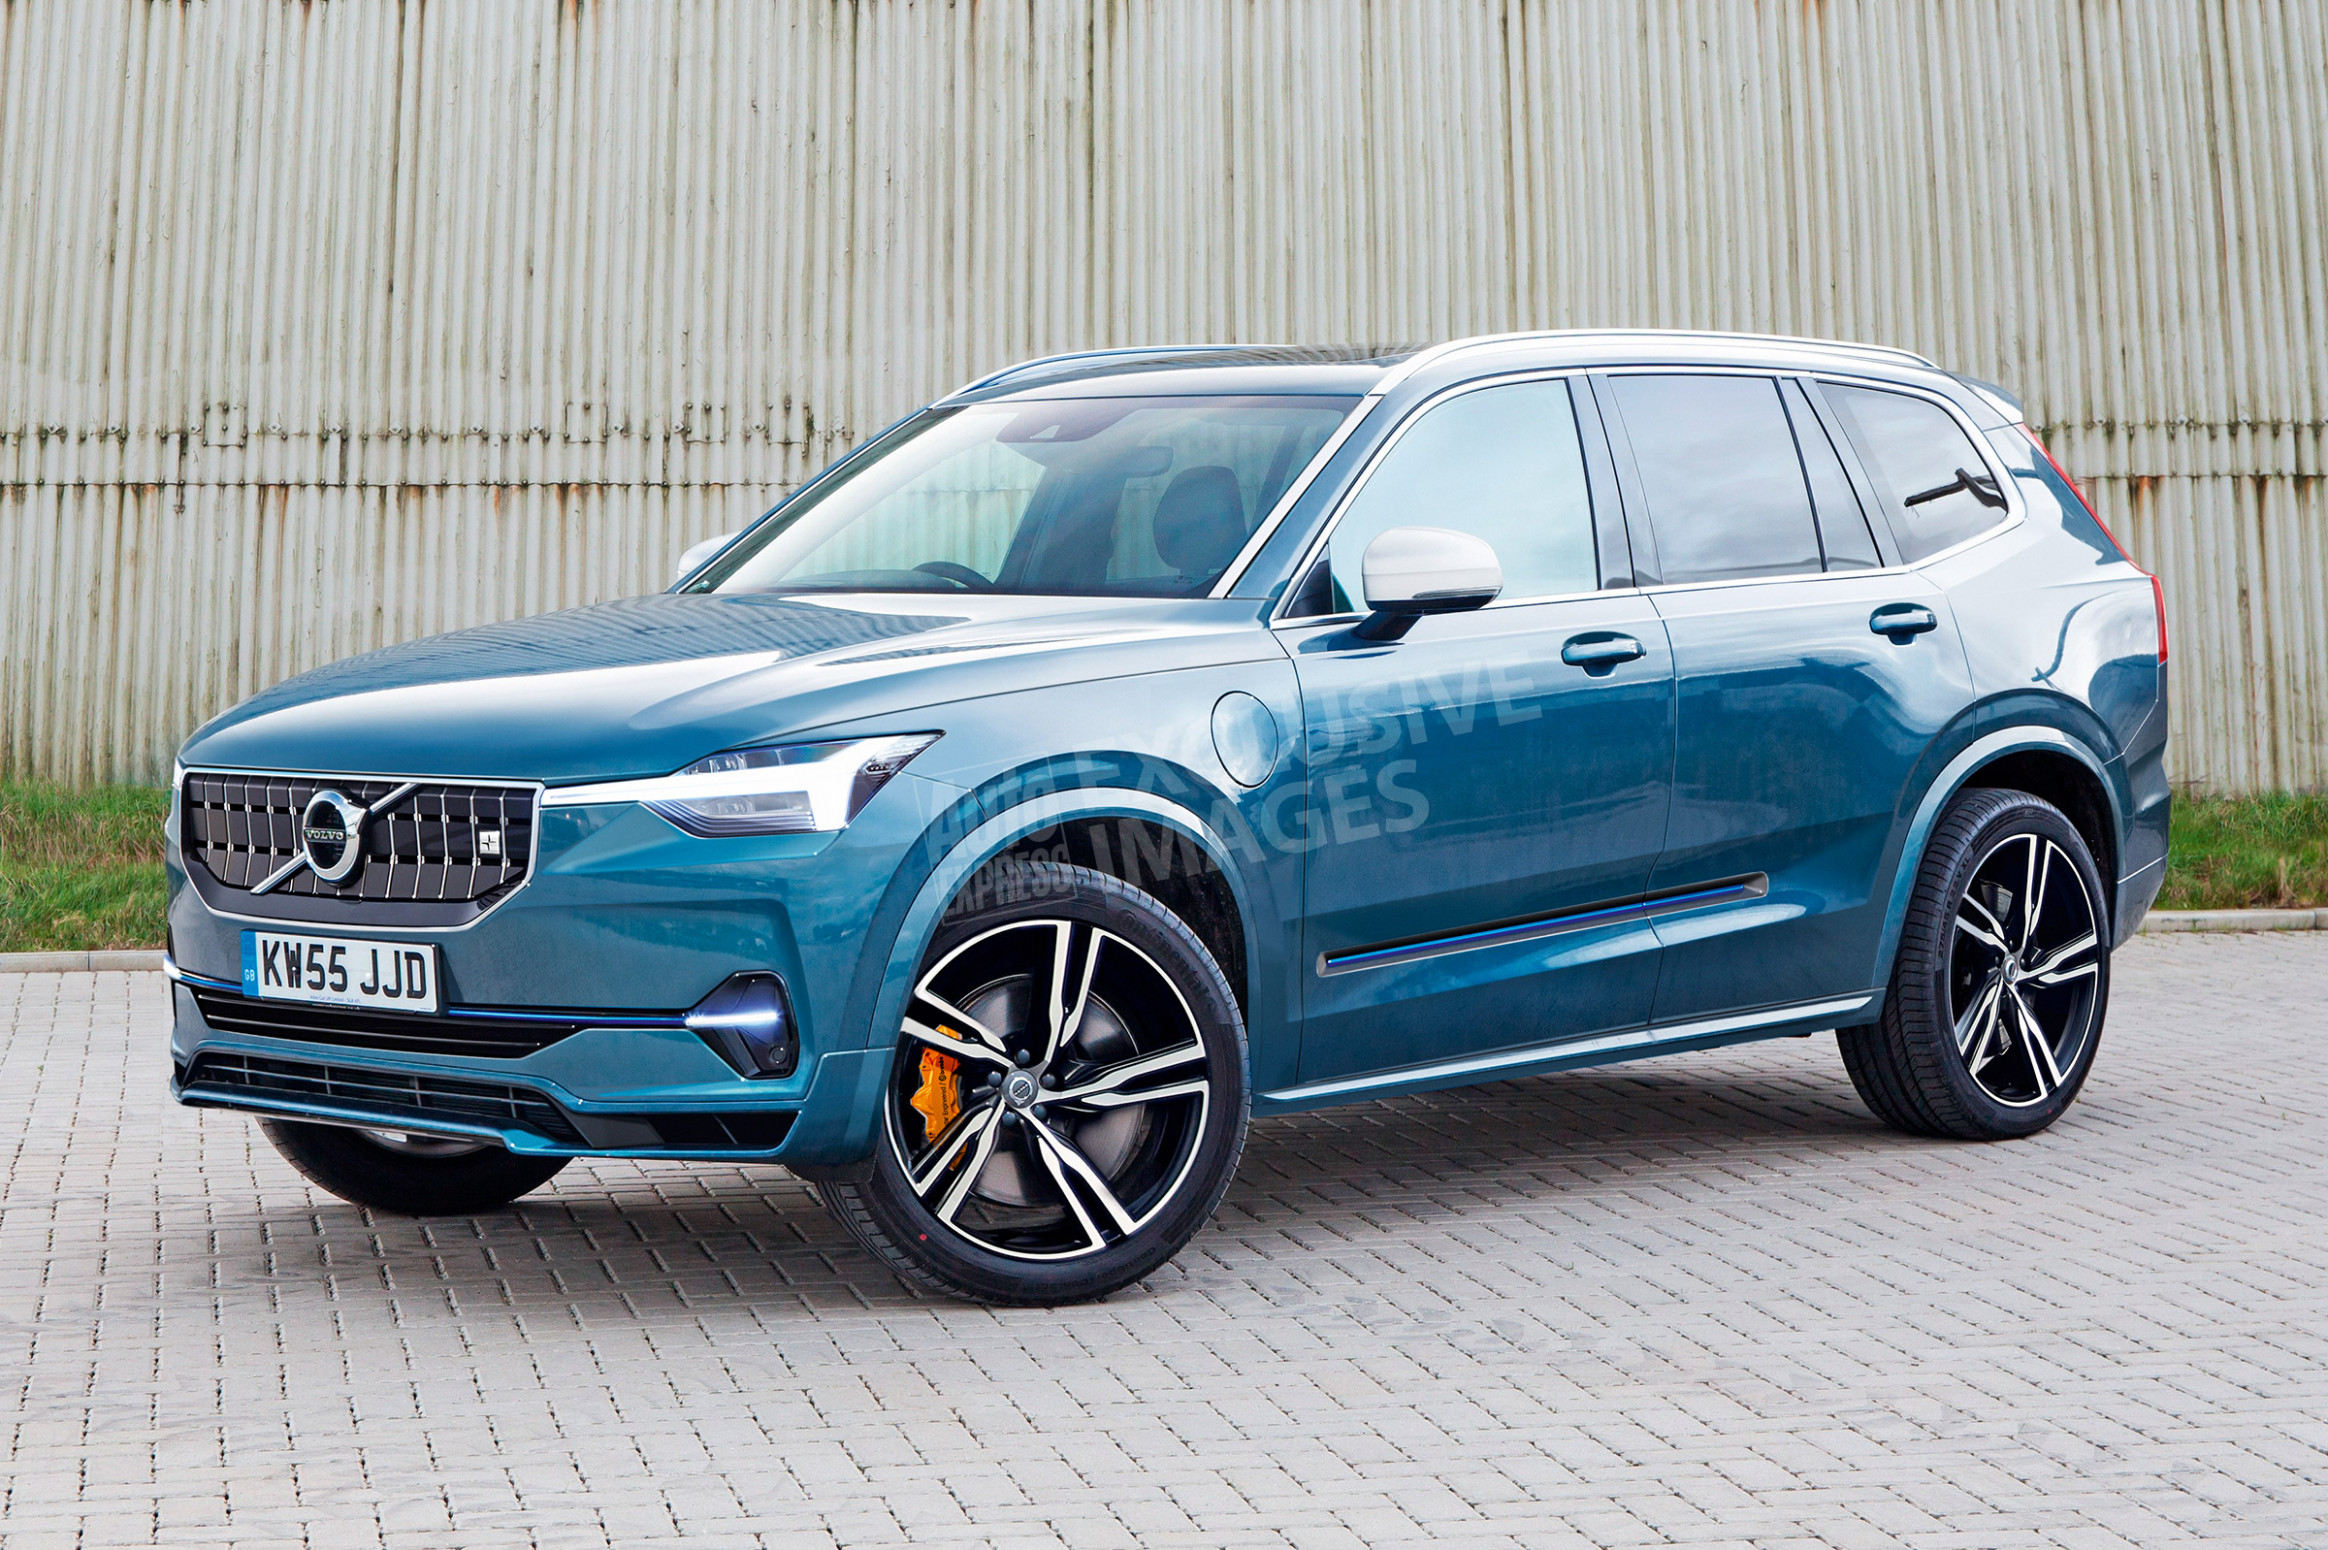 Concept Volvo Model Year 2022